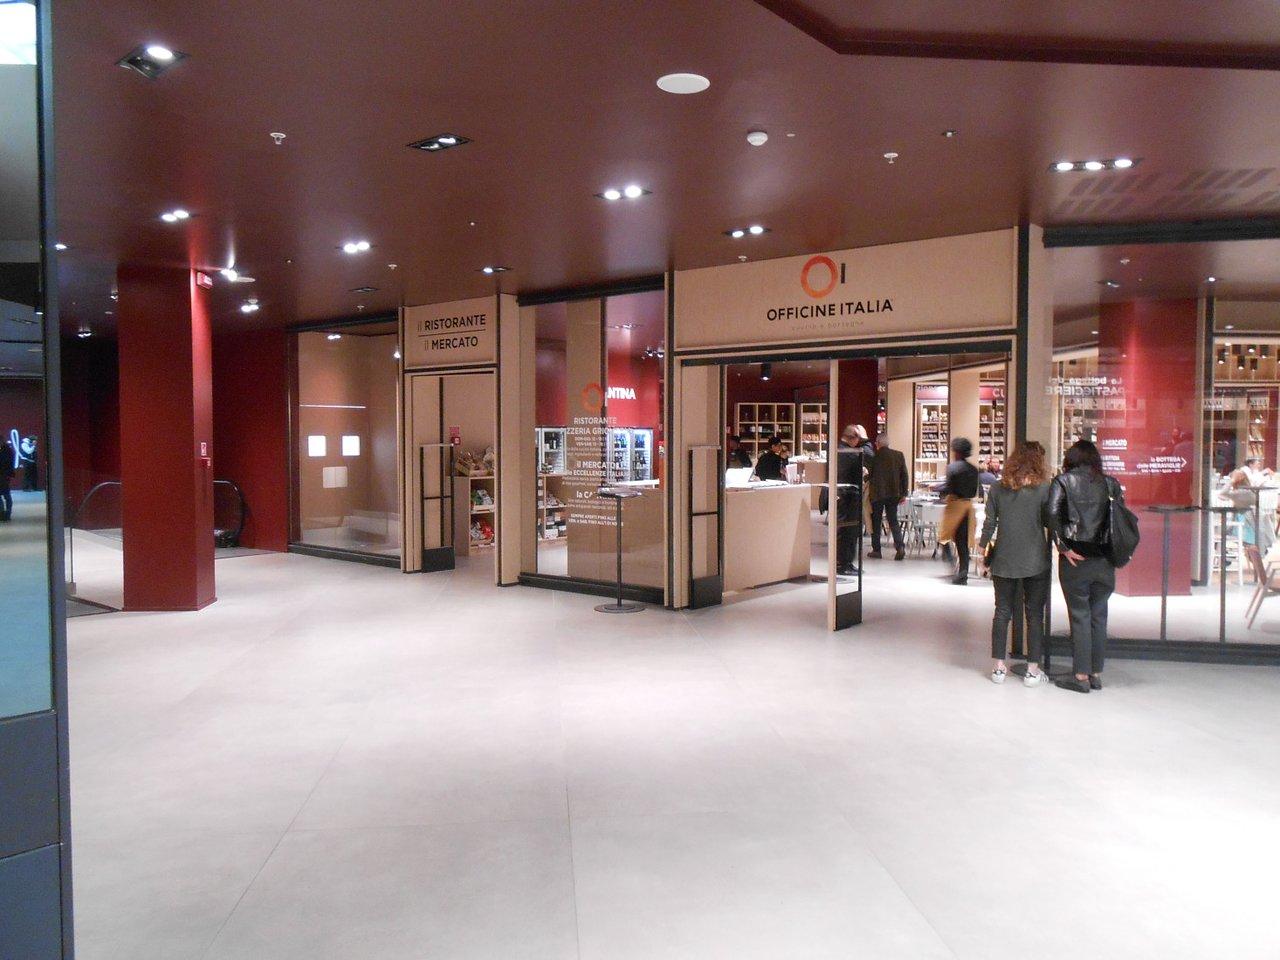 Auchan Tavoli Da Giardino.Fvn8db4x6av0om